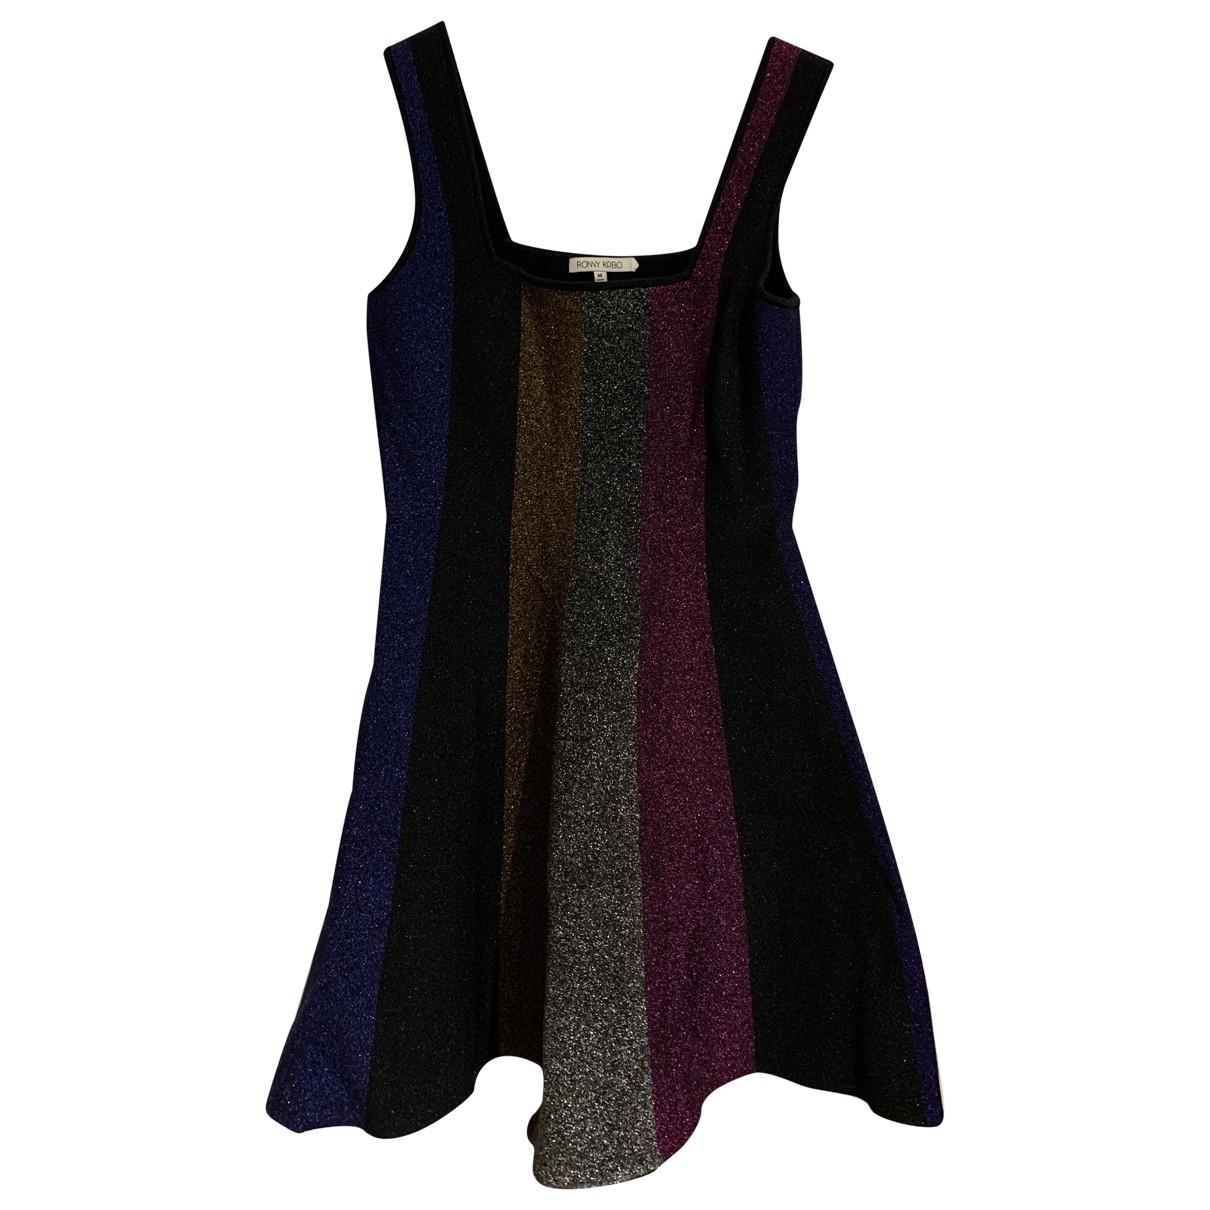 Ronny Kobo \N Kleid in  Bunt Polyester